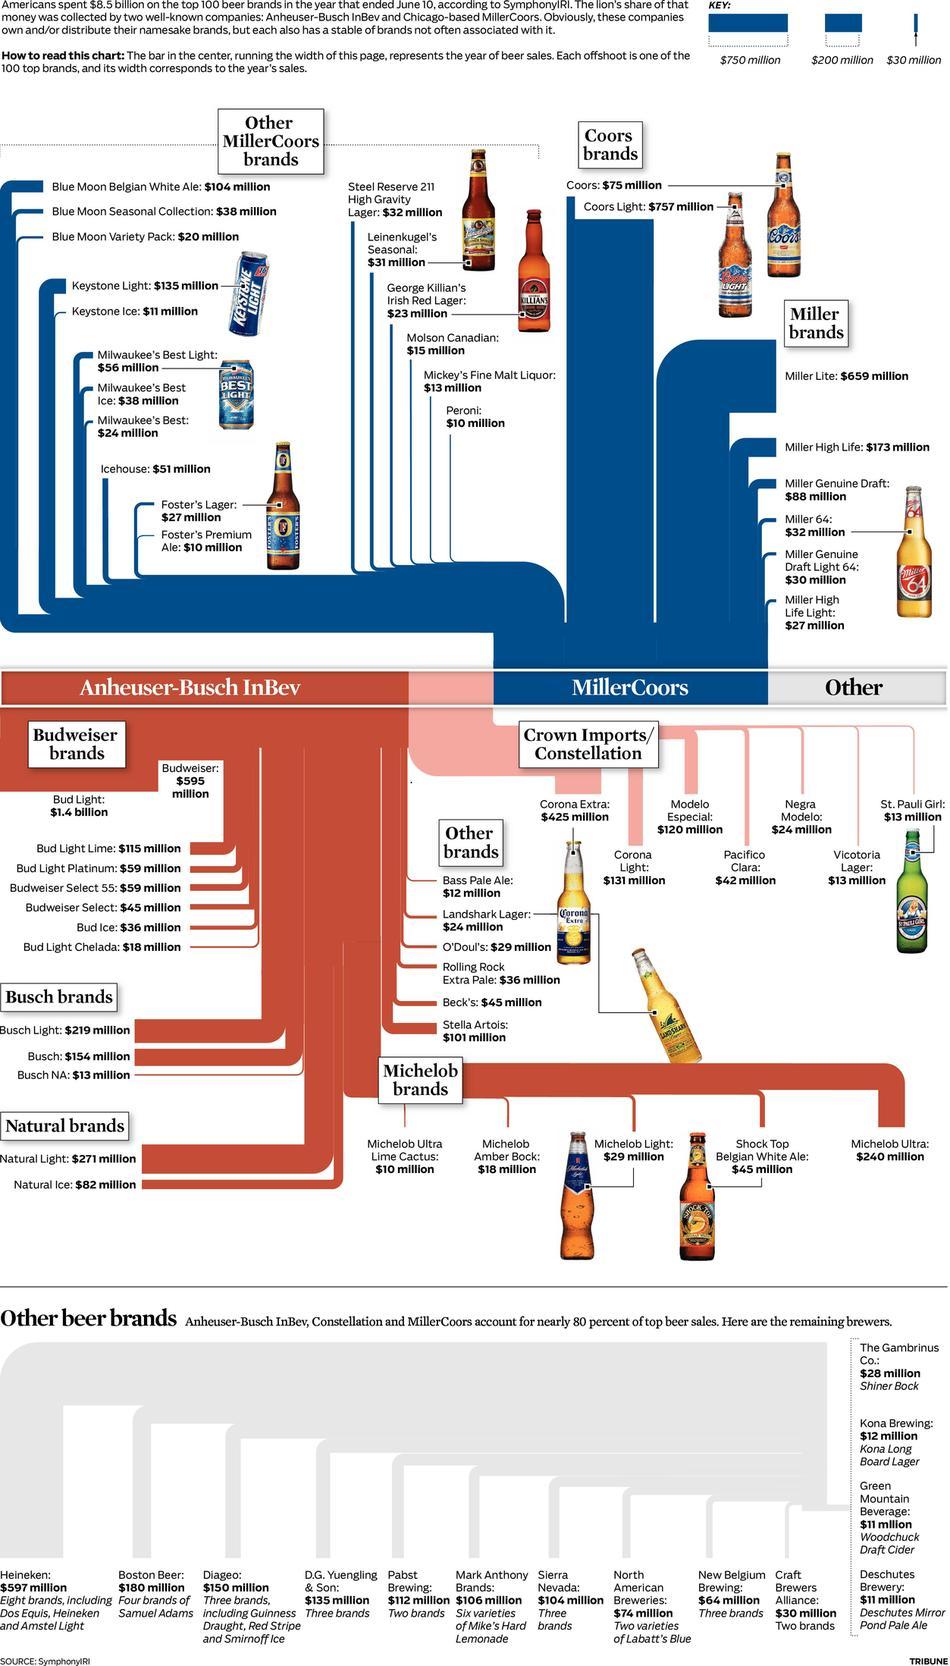 Of the Top 100 Beer Brands, Anheiser-Busch InBev and